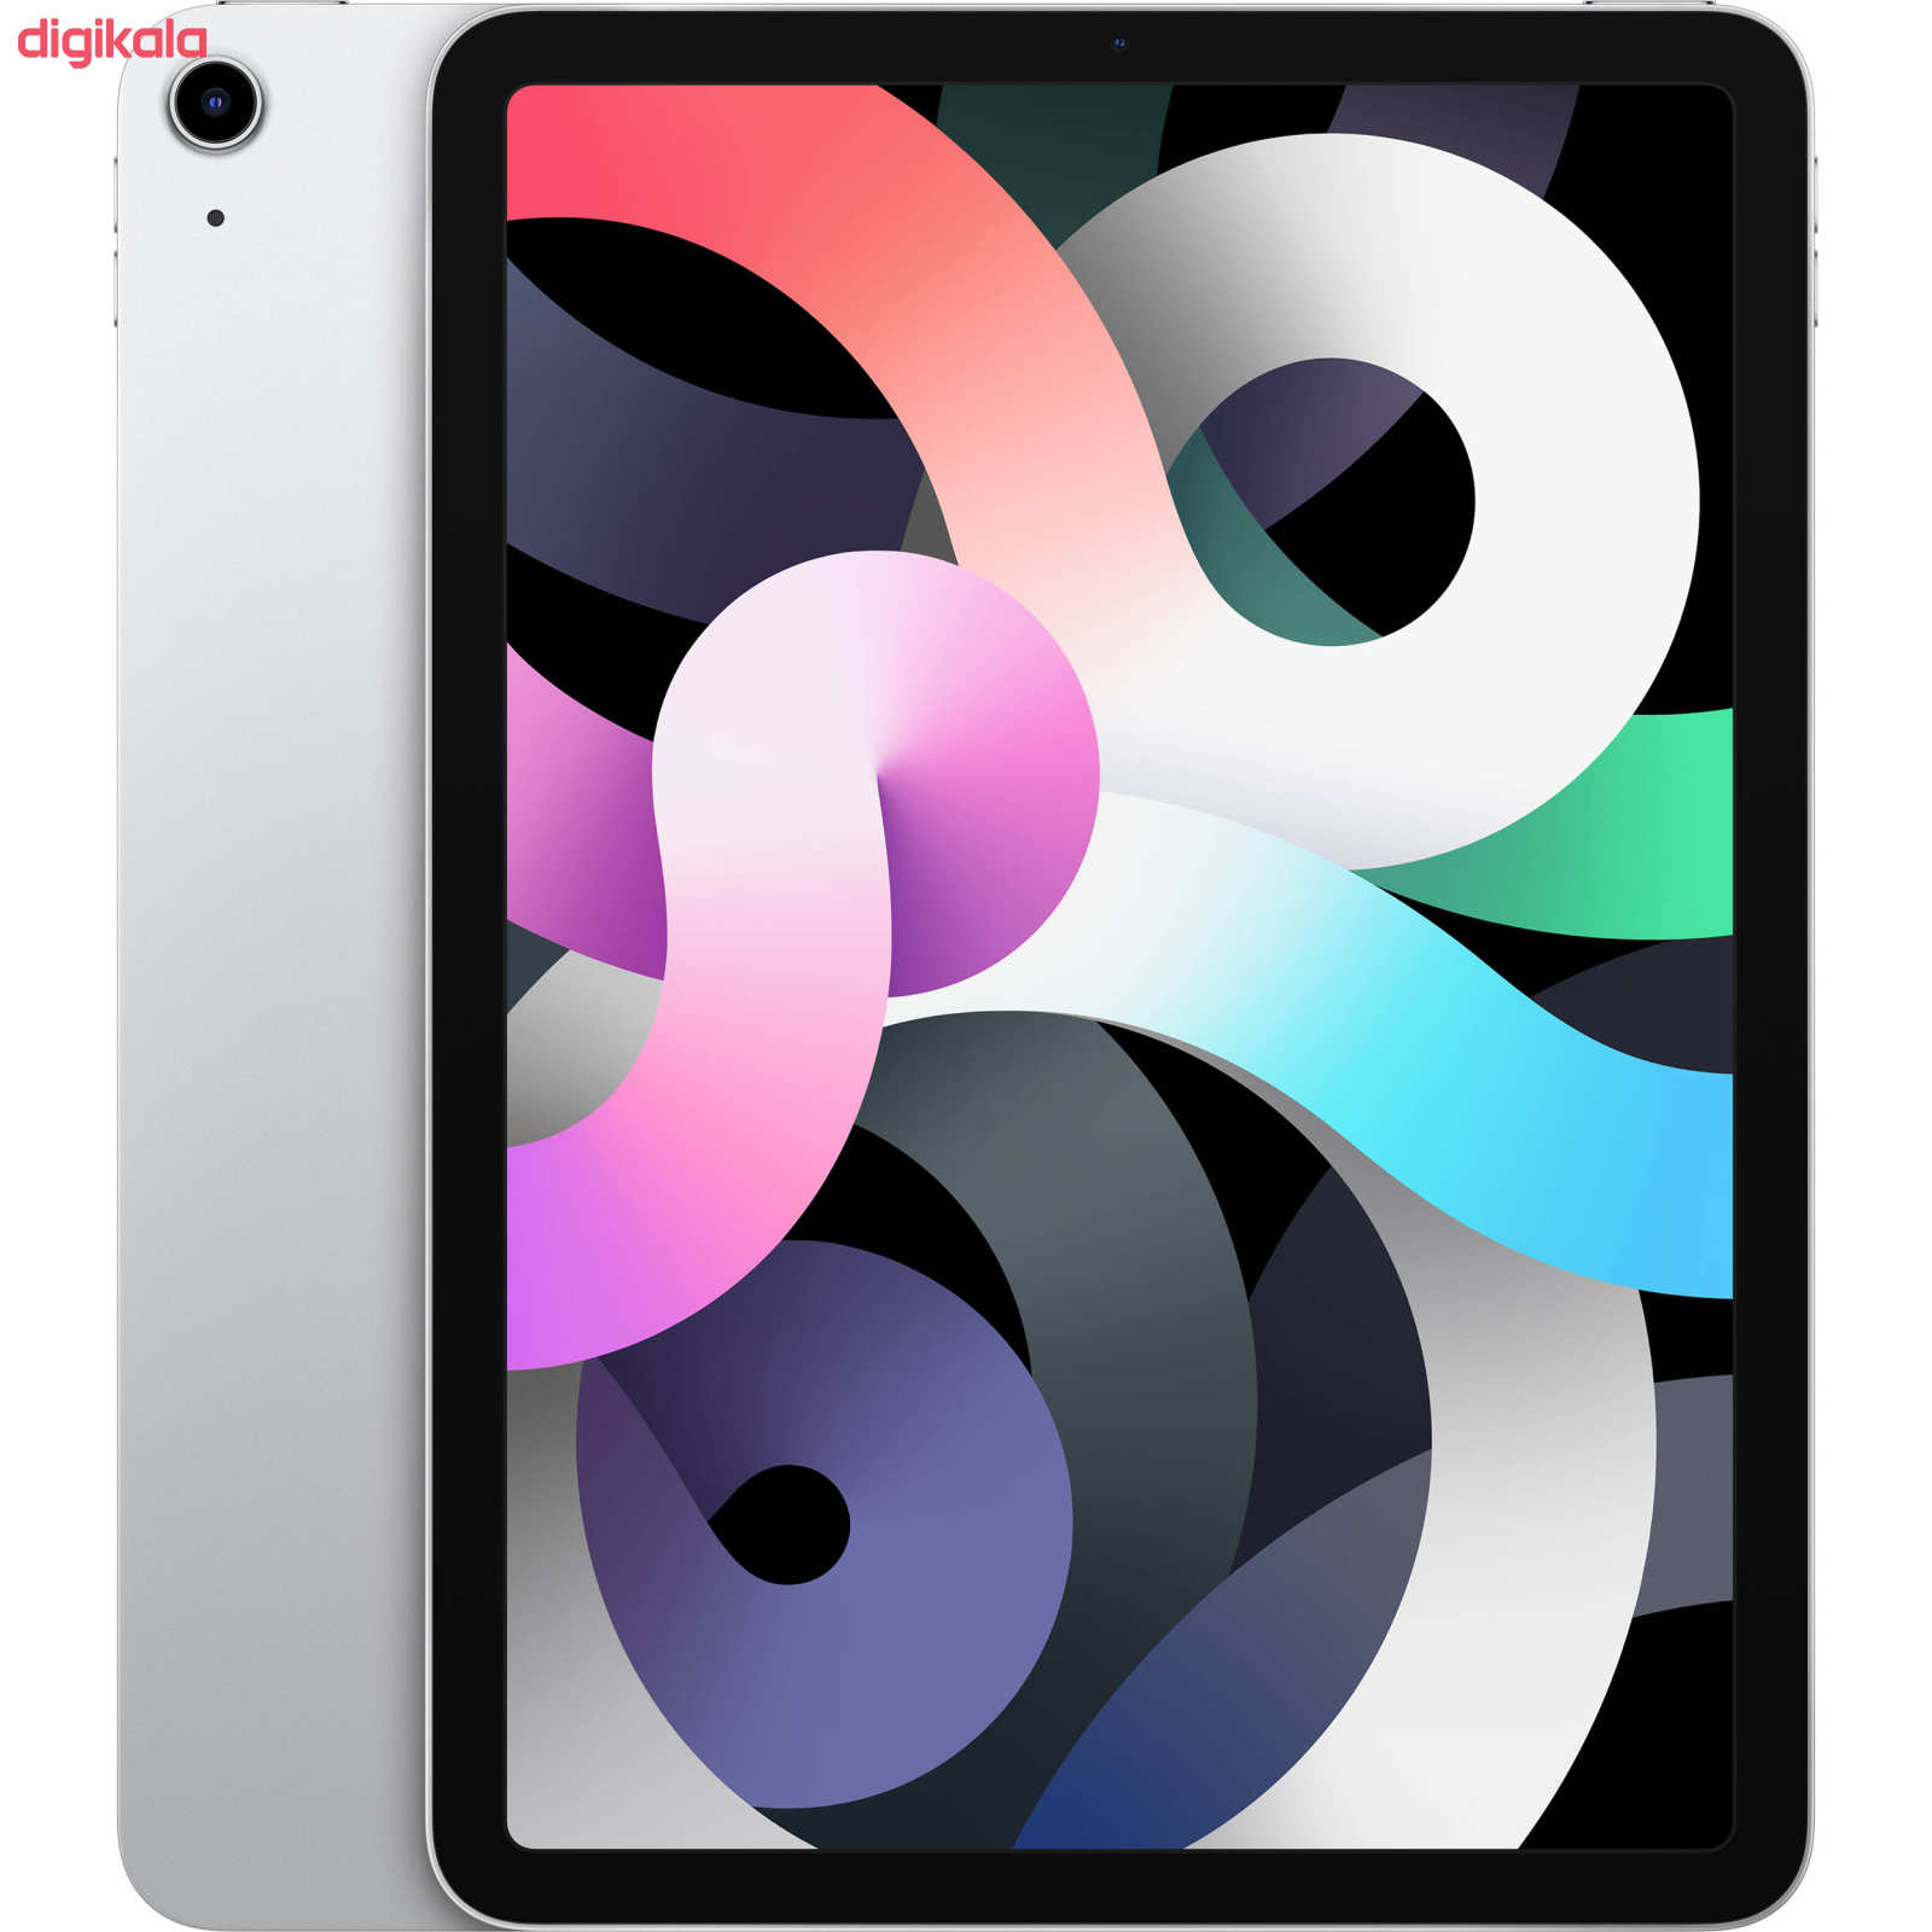 تبلت اپل مدل iPad Air 10.9 inch 2020 WiFi ظرفیت 256 گیگابایت  main 1 13